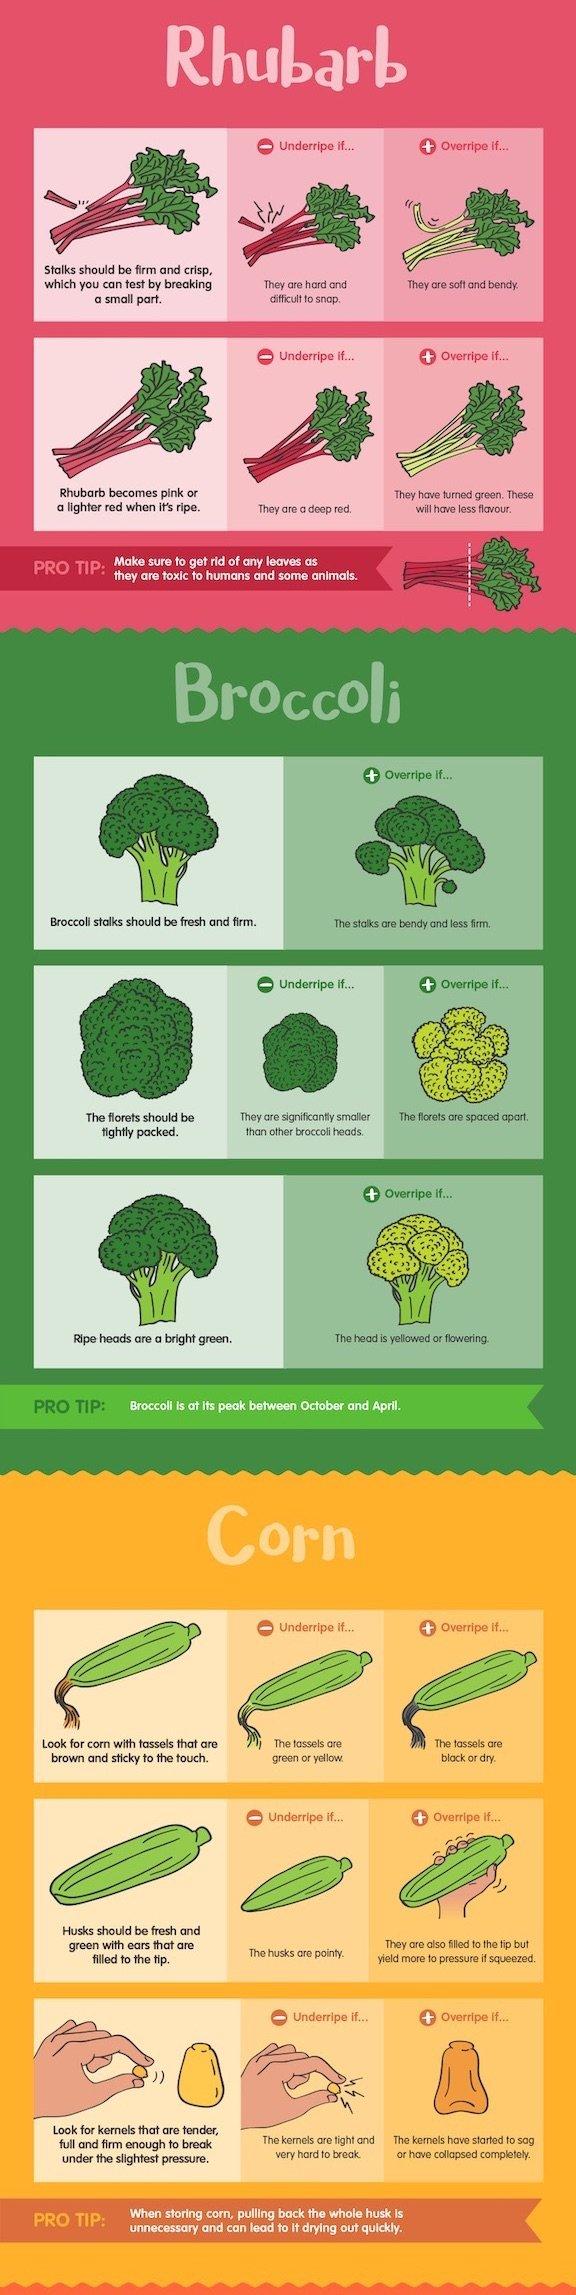 How to choose rhubarb, broccoli, and corn